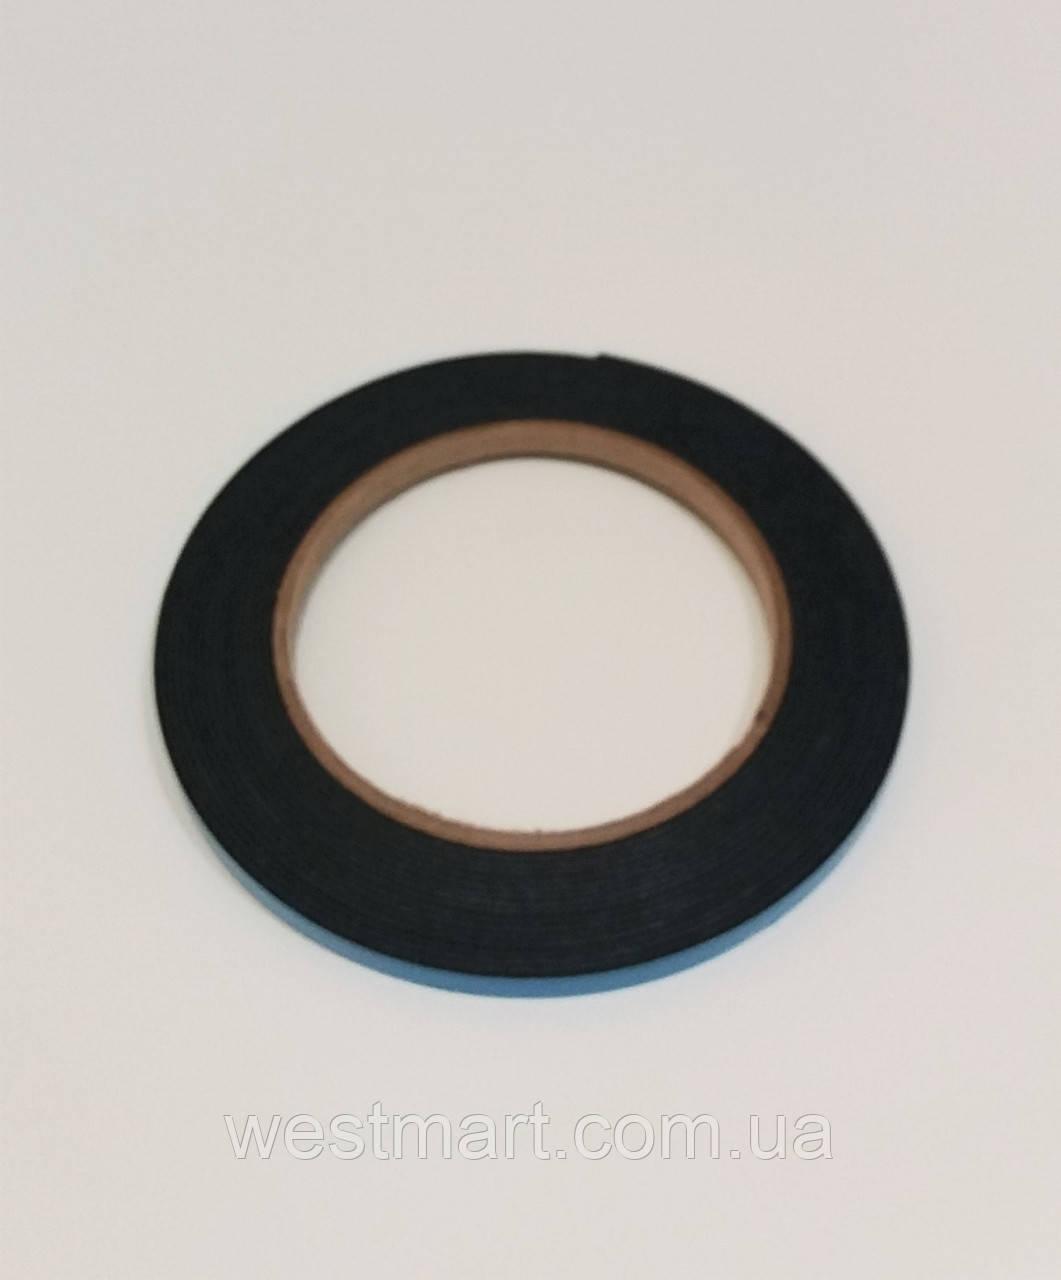 Вспененная двусторонняя клейкая лента MP398EB 6 мм (скотч)